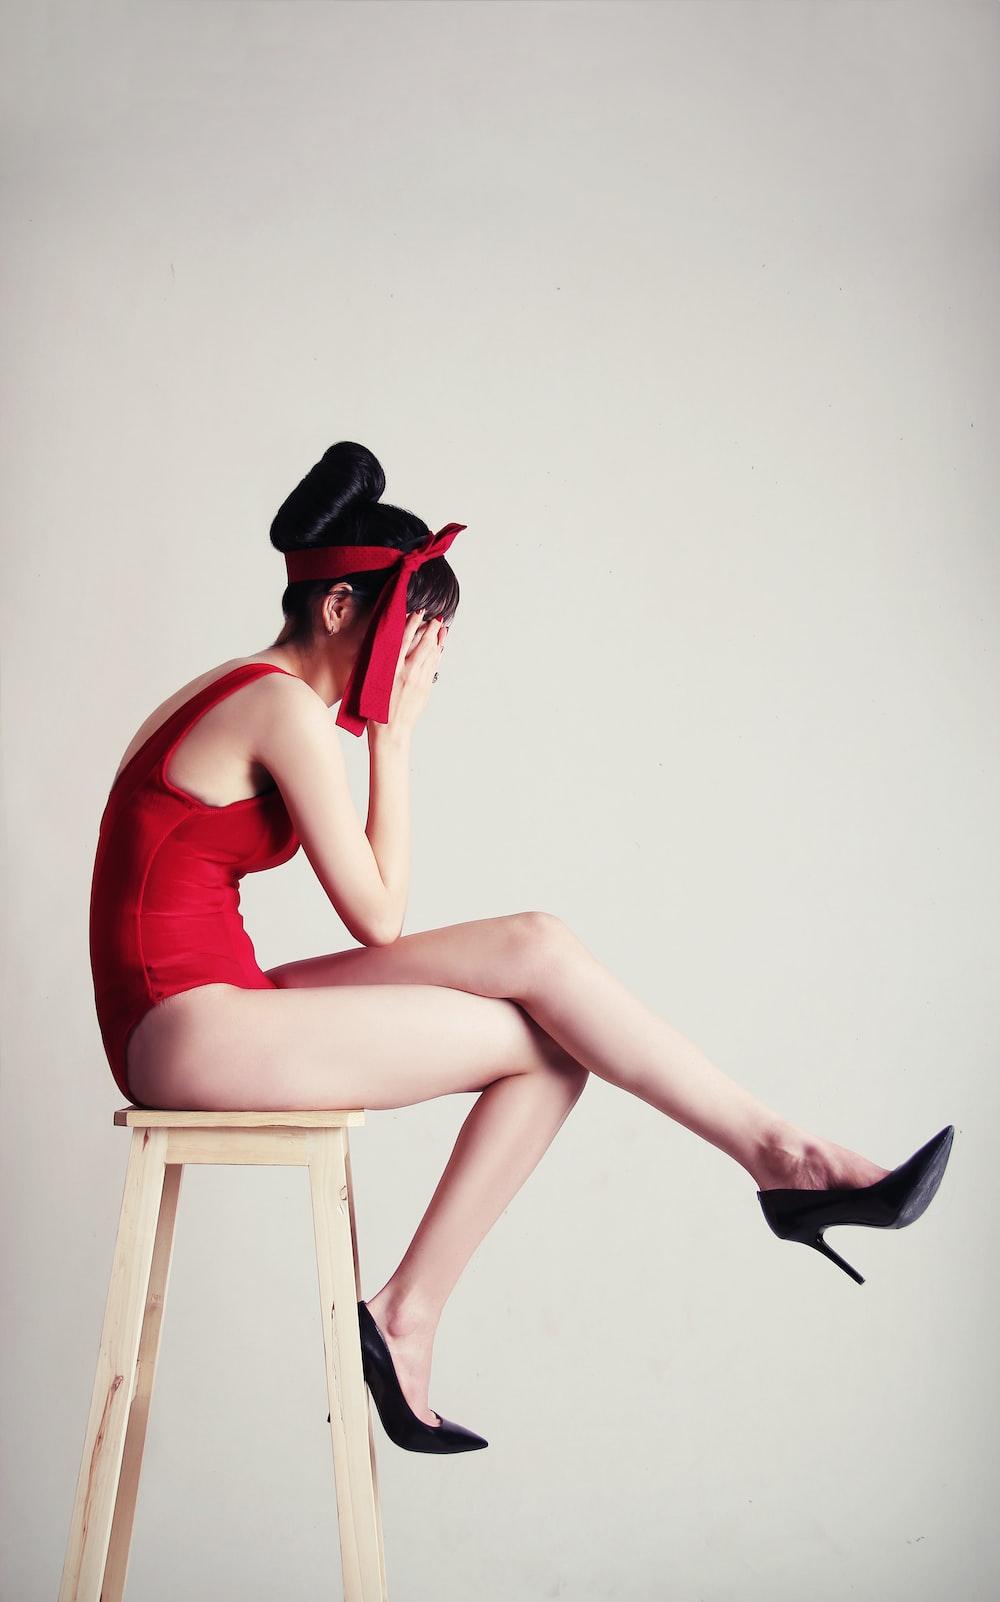 upset woman sitting on stool with white background